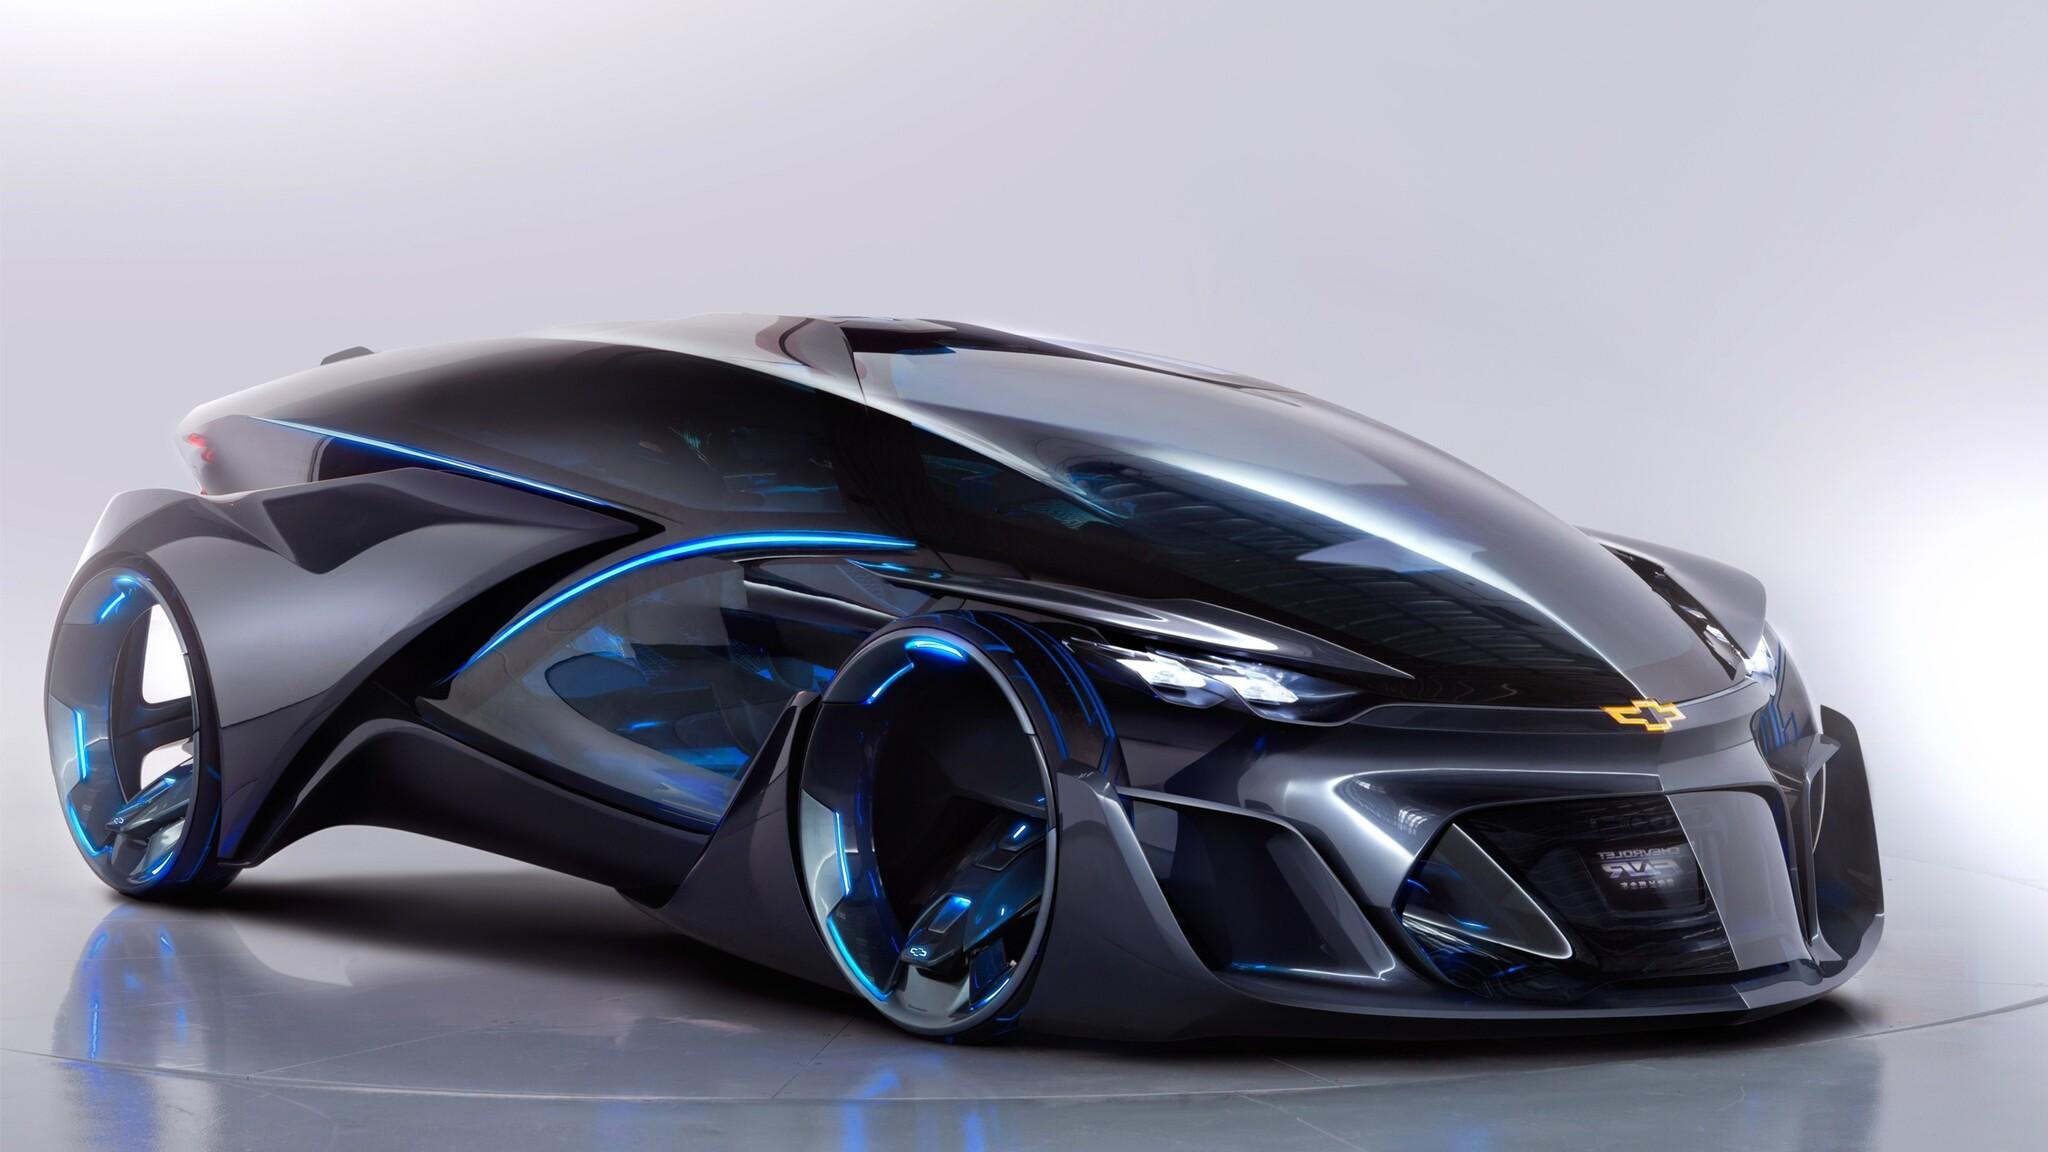 2048x1152 Chevrolet FNR Concept Car 2048x1152 Resolution ...